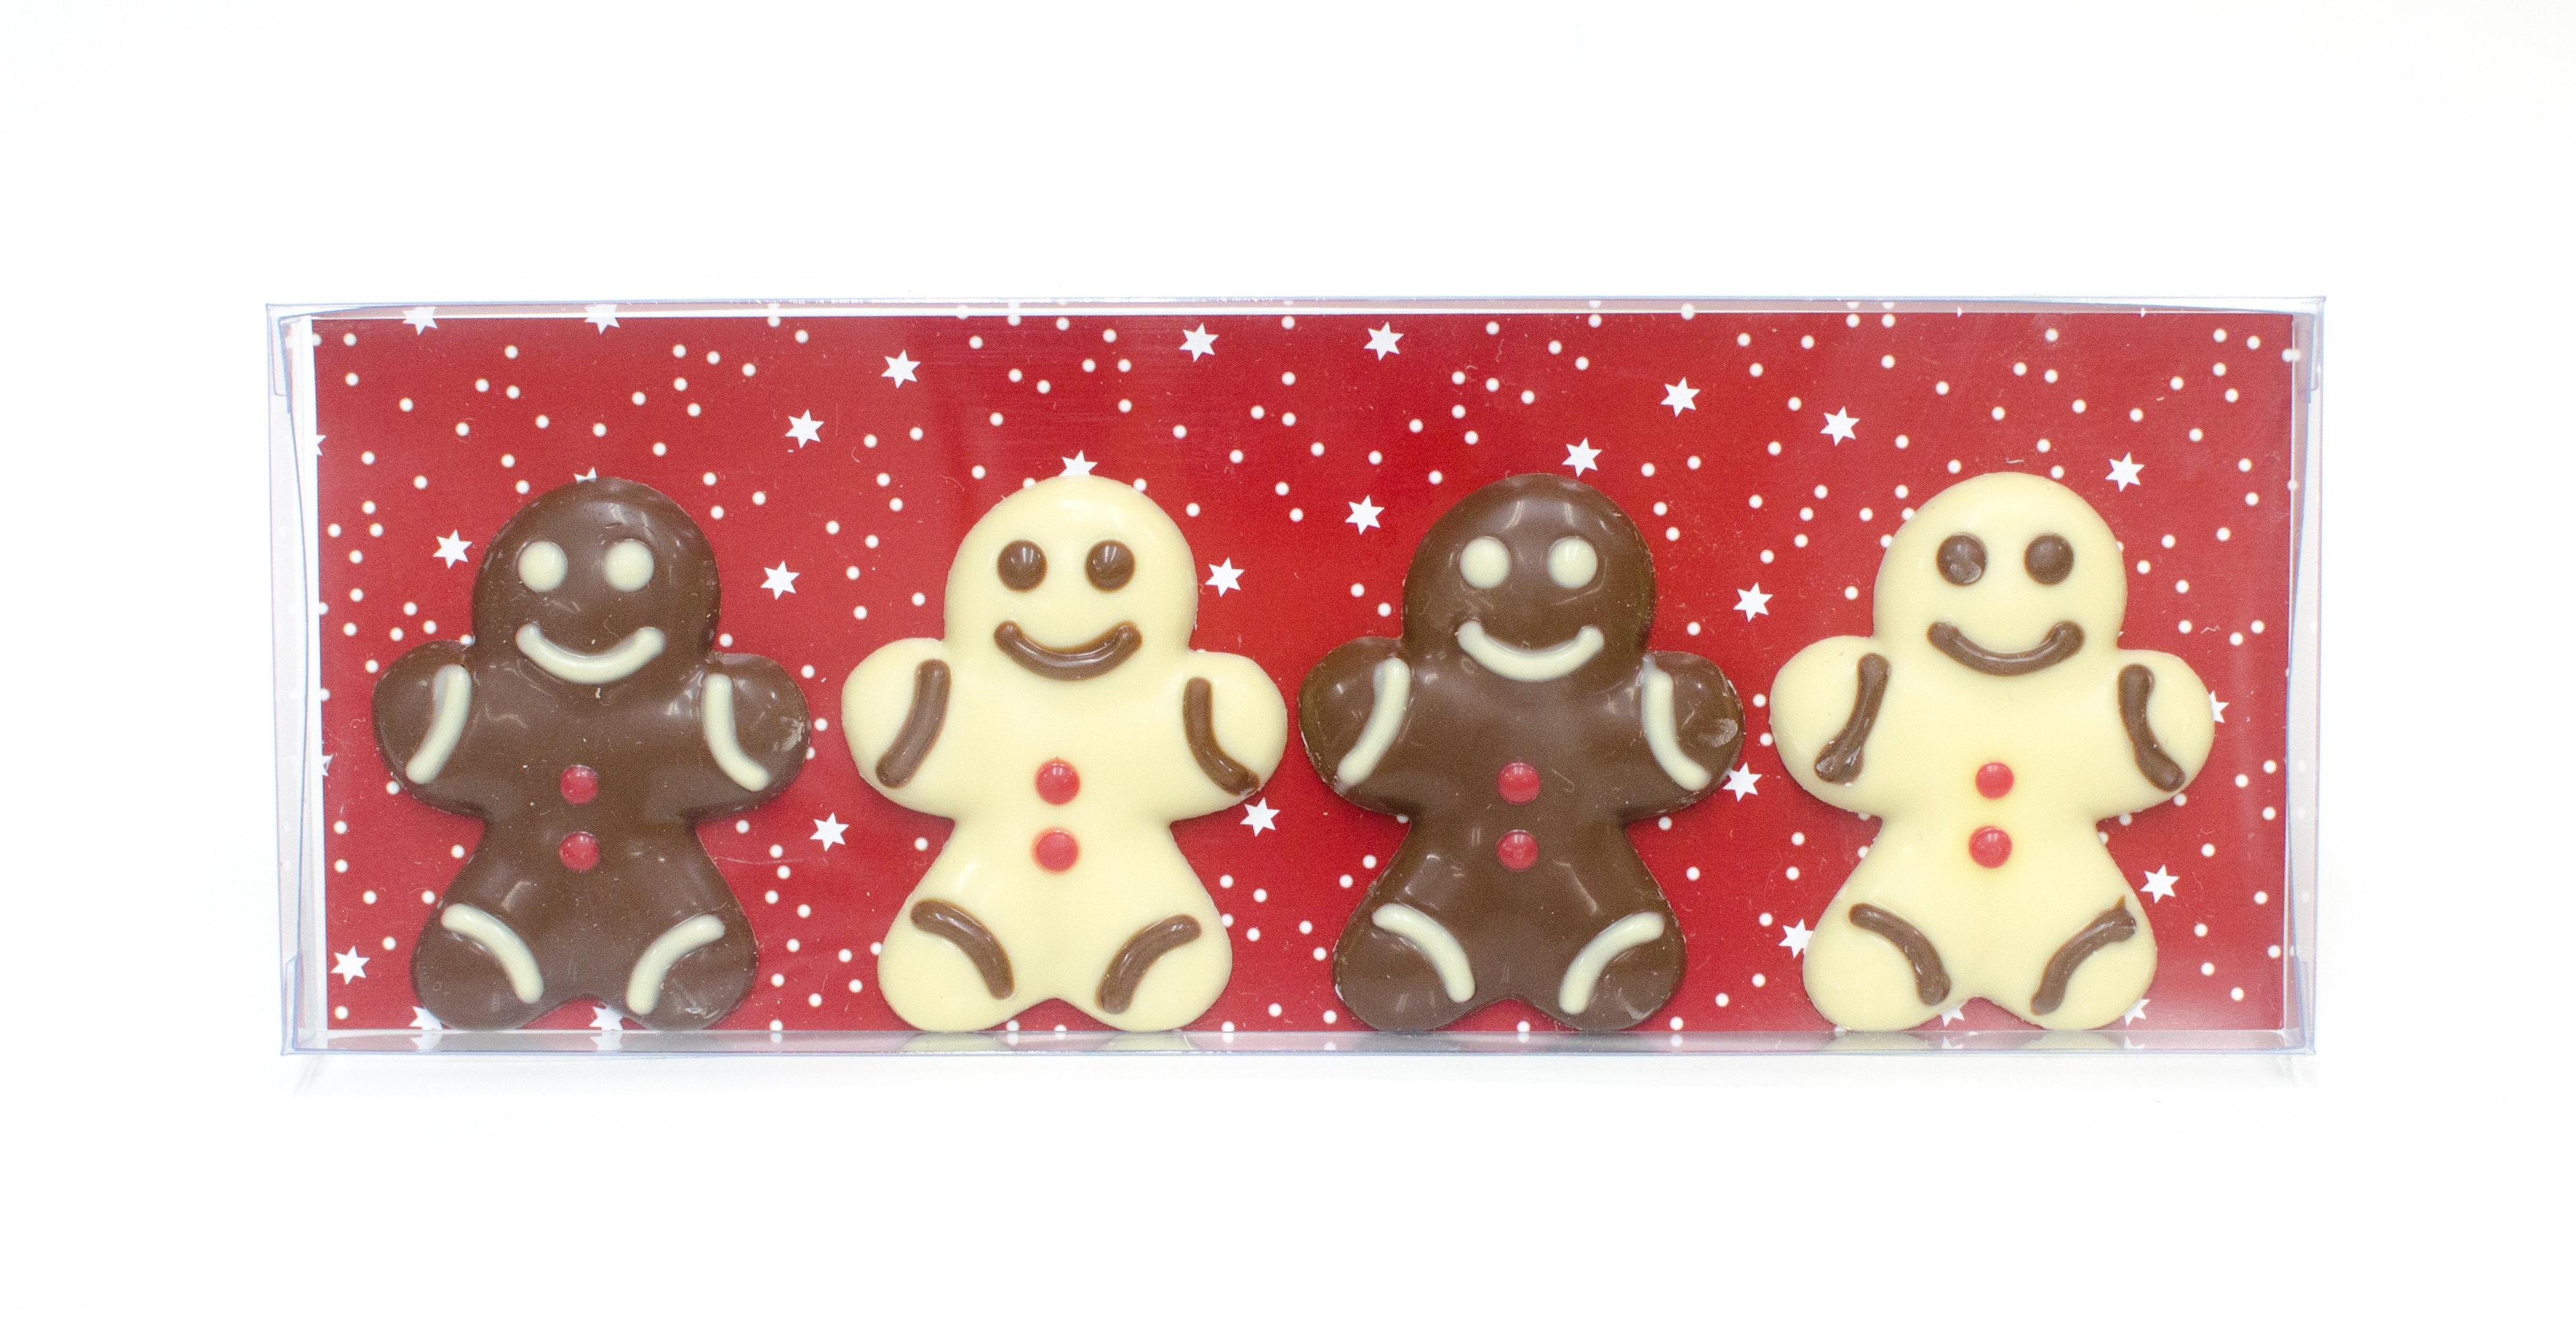 Belgian Chocolate Gingerbread Man 4 Pcs In Gift Box